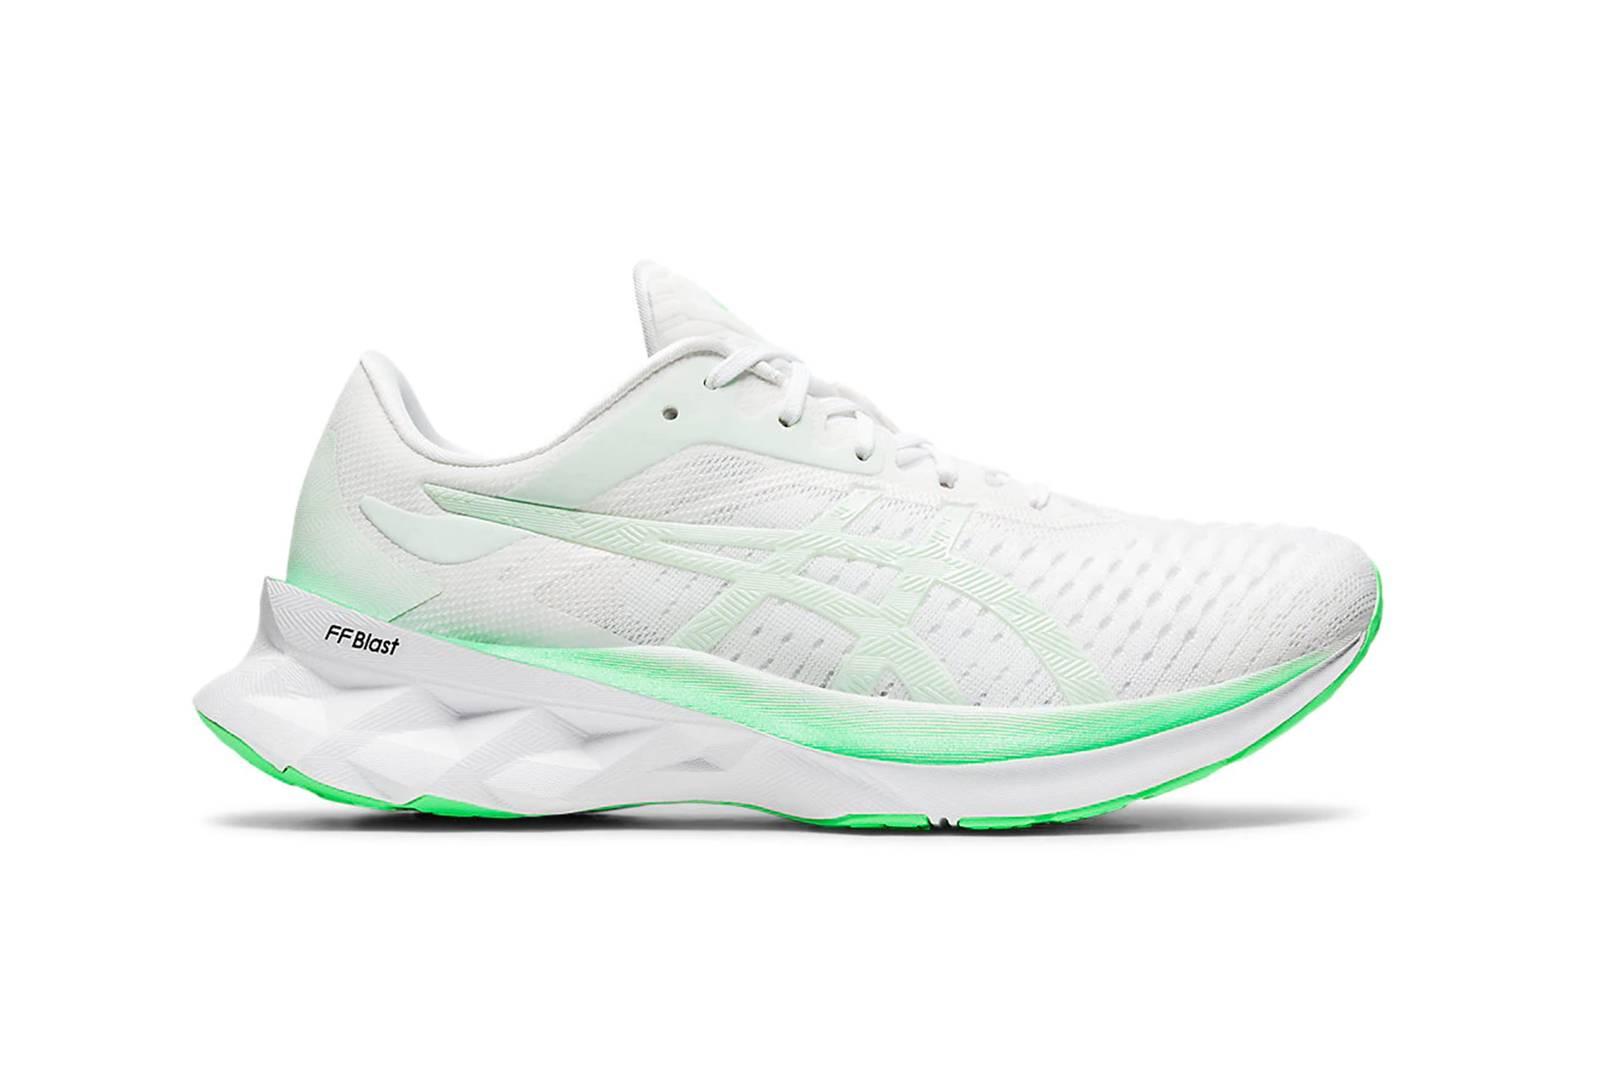 21 Best Running Shoes For Women 2020